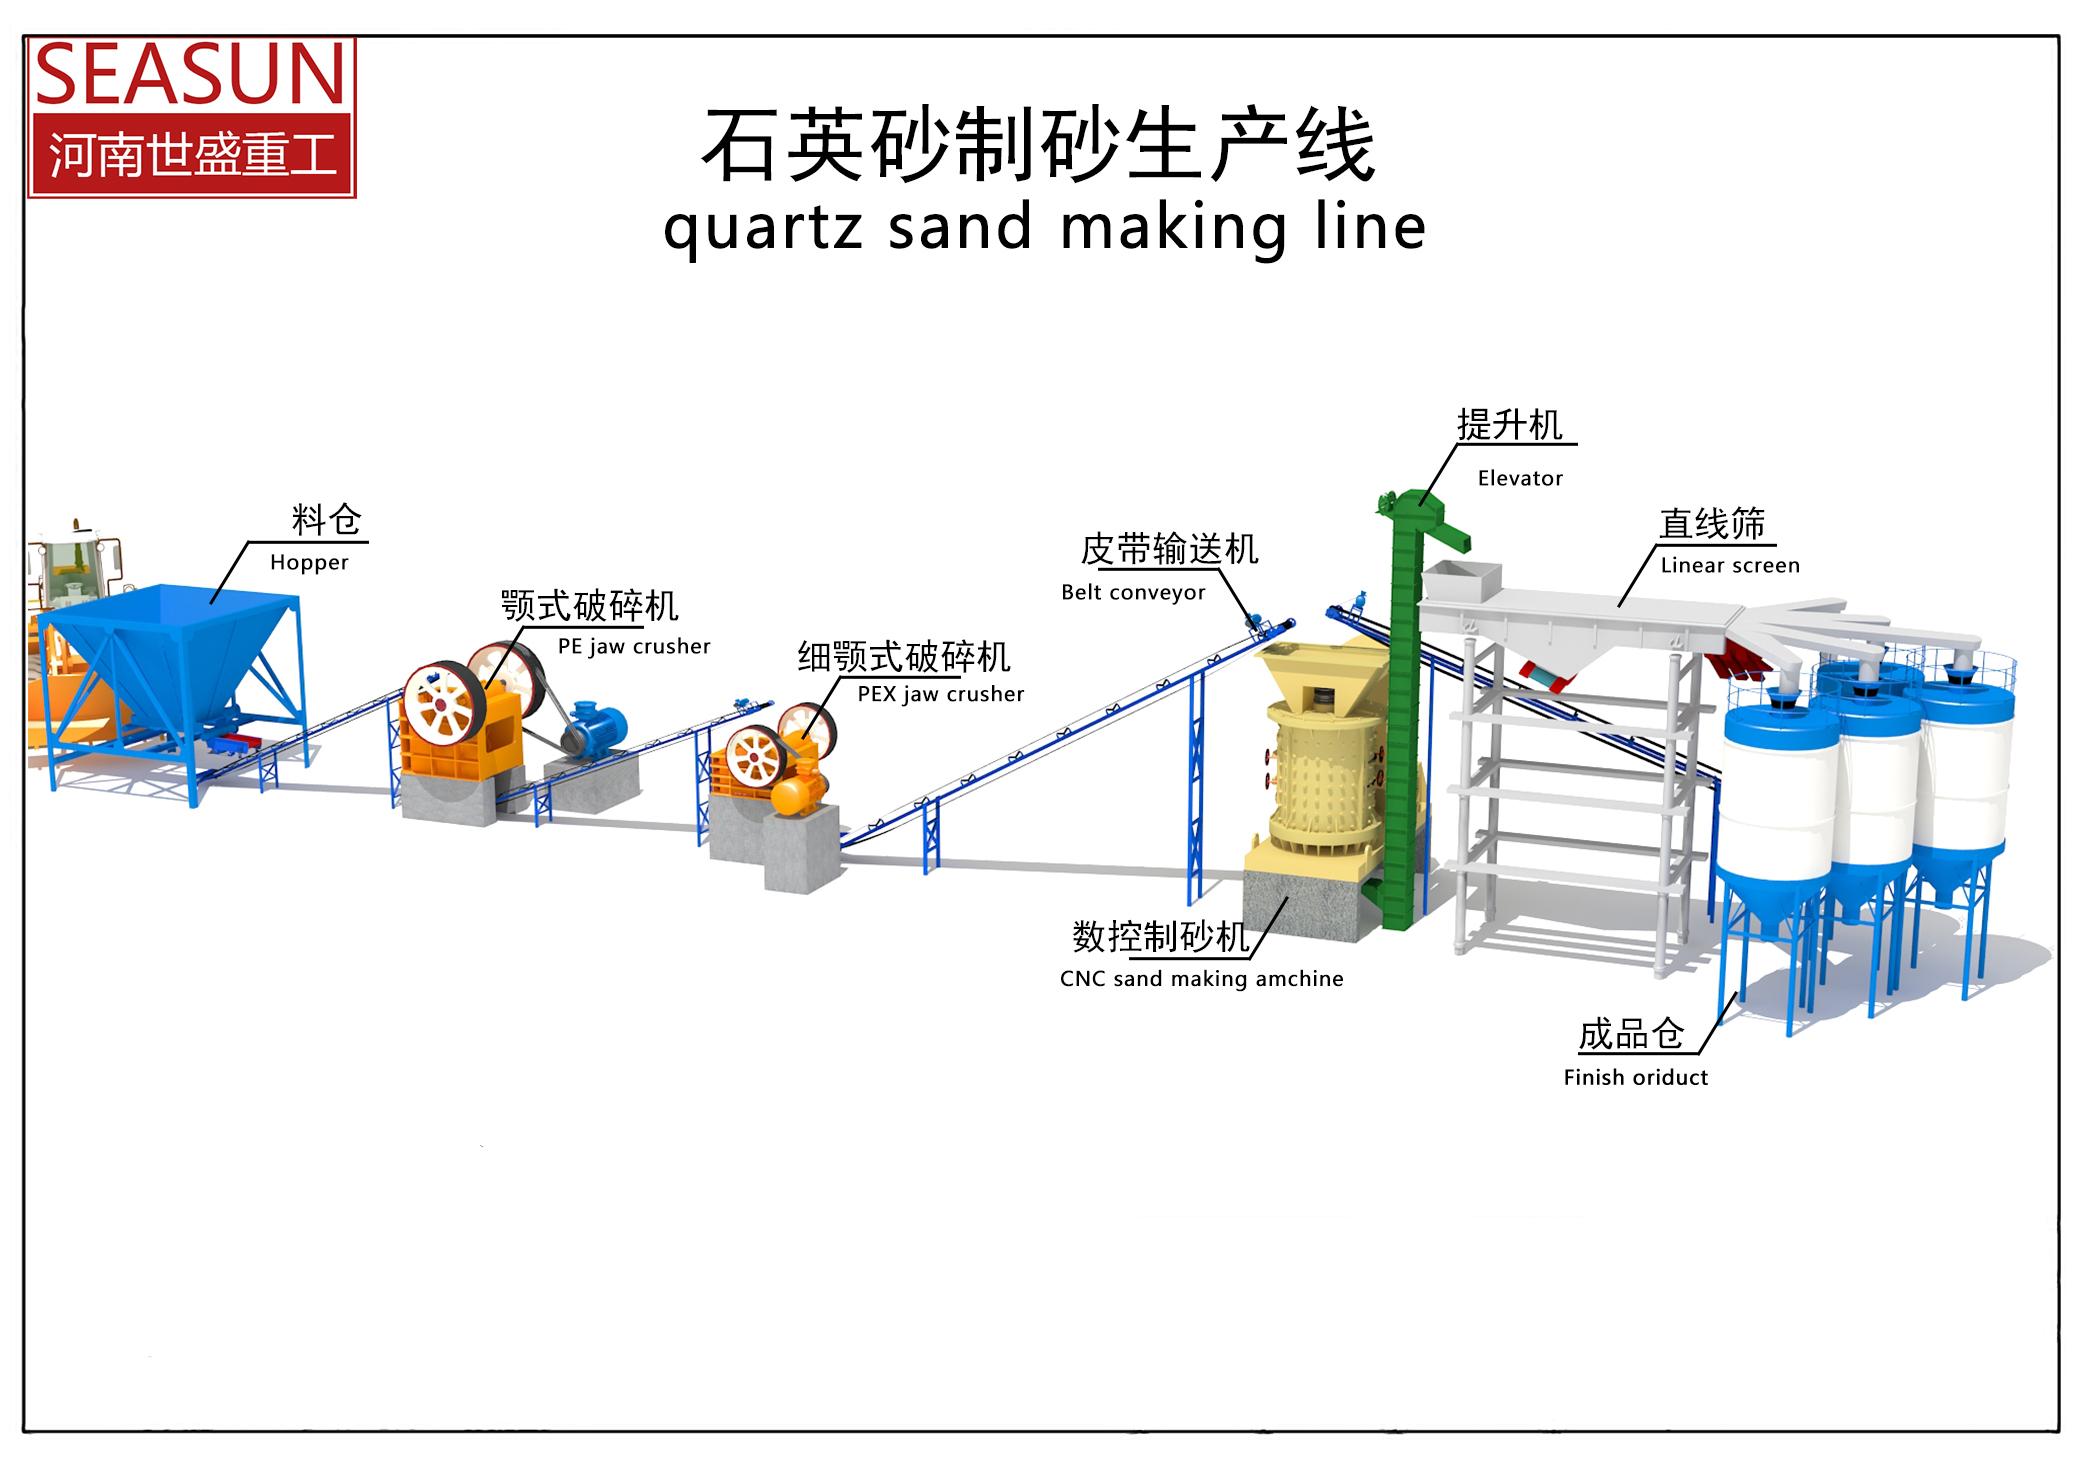 Henan Shisheng Heavy Industry Machinery Co., Ltd.